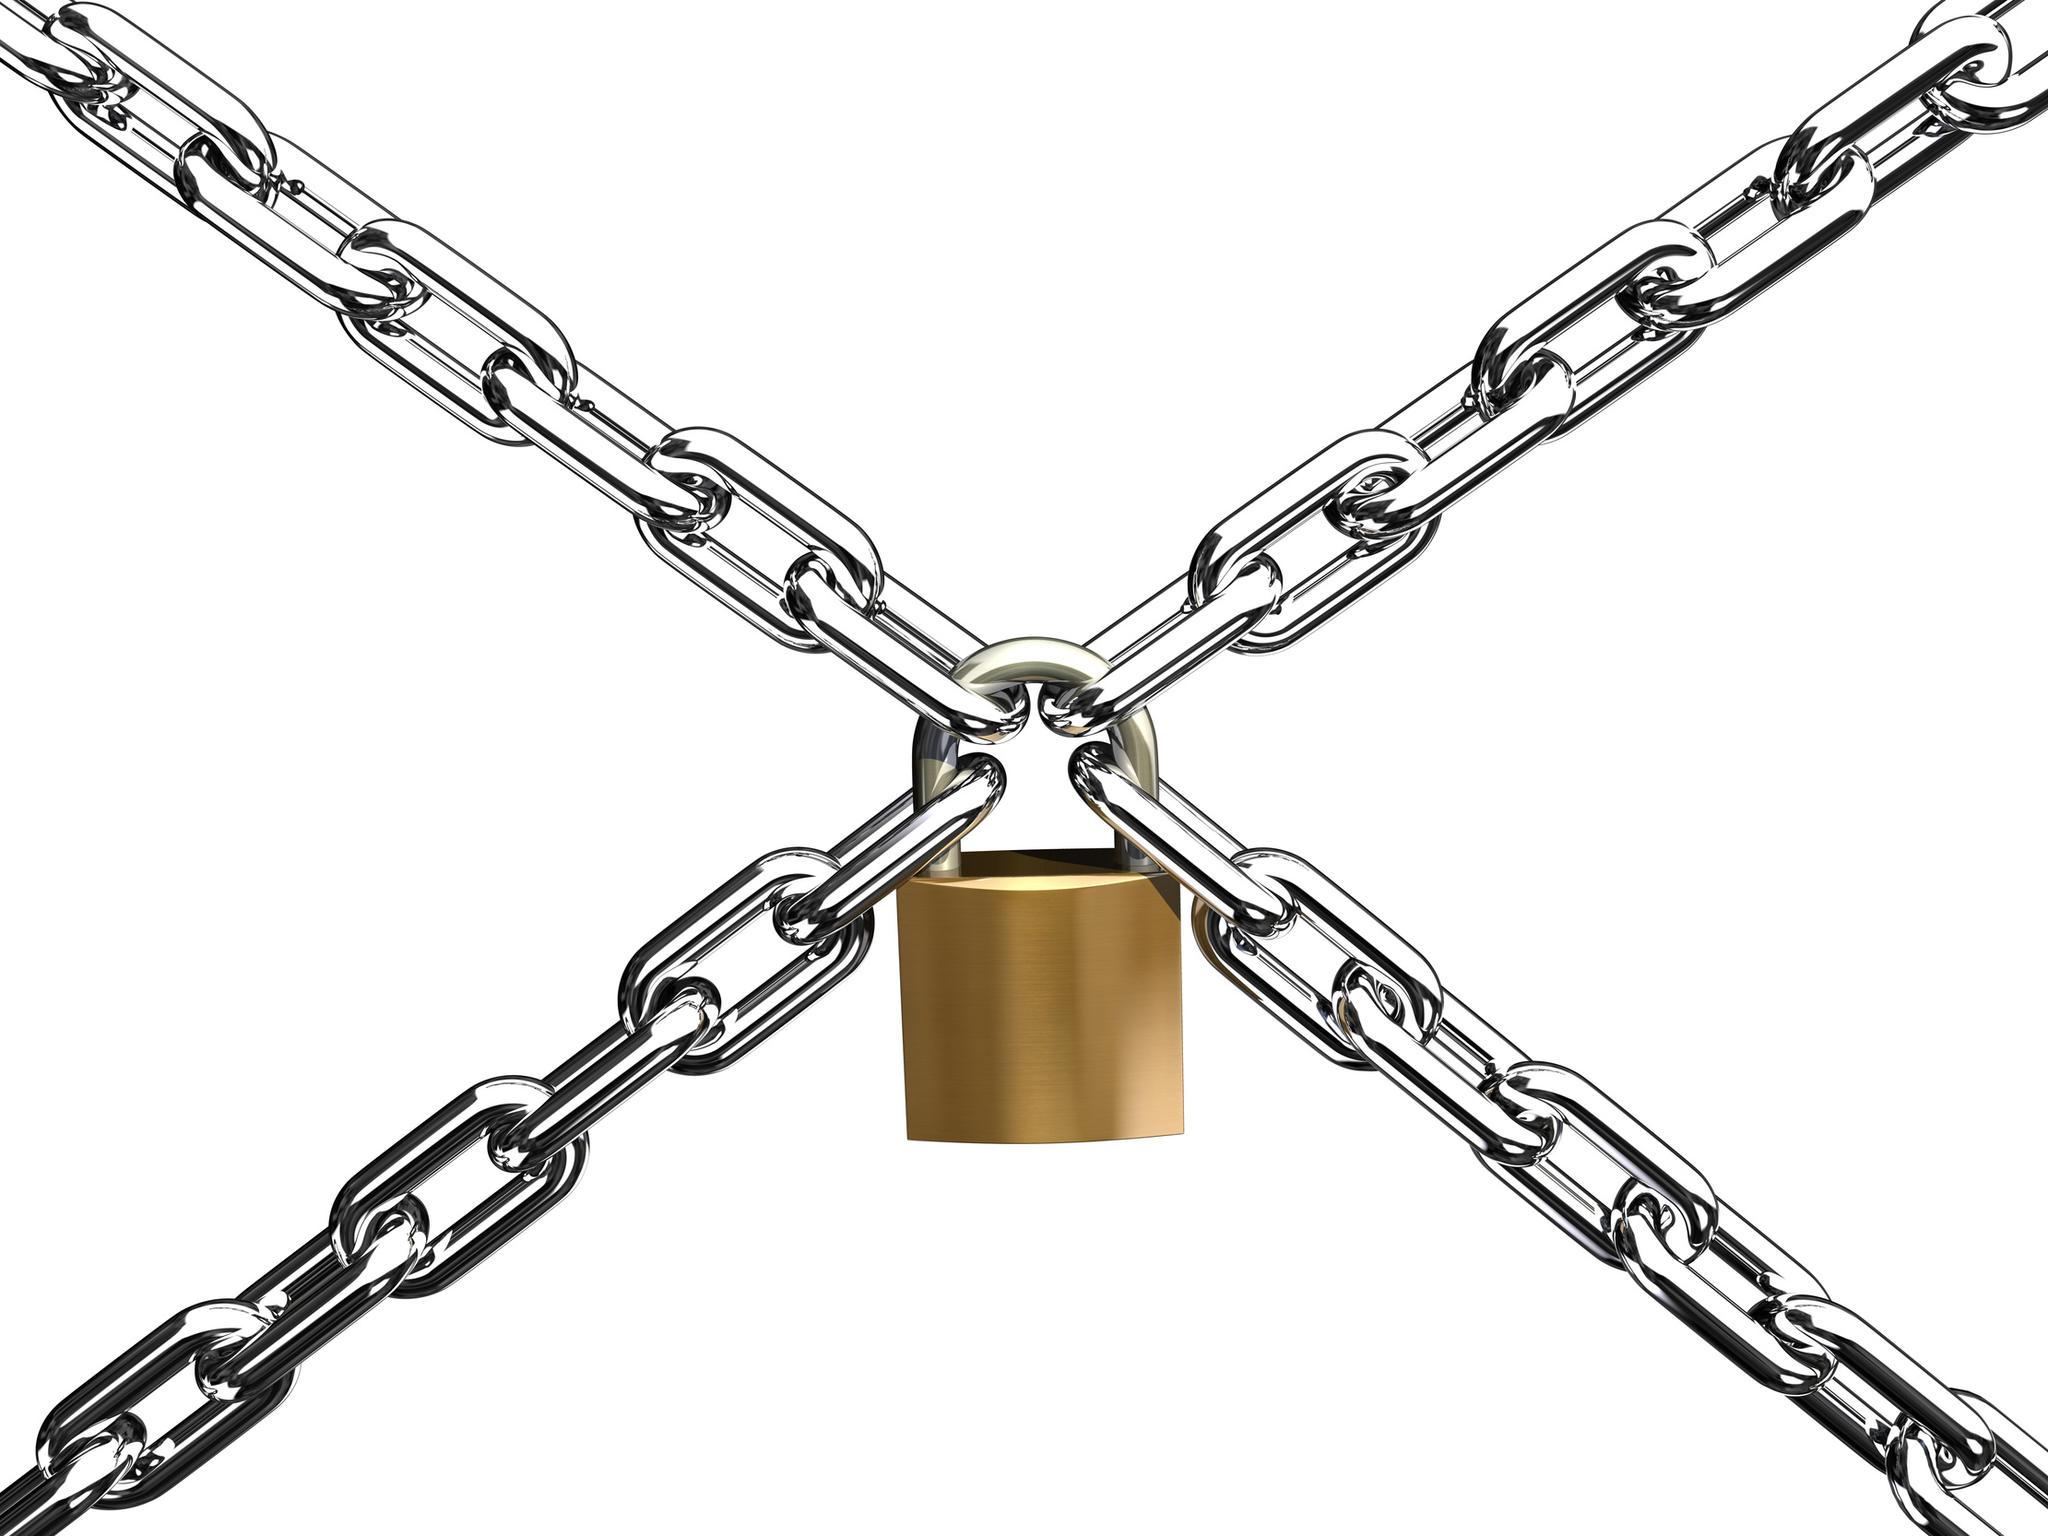 chain cross lock   Pivotel (Pty) Ltd